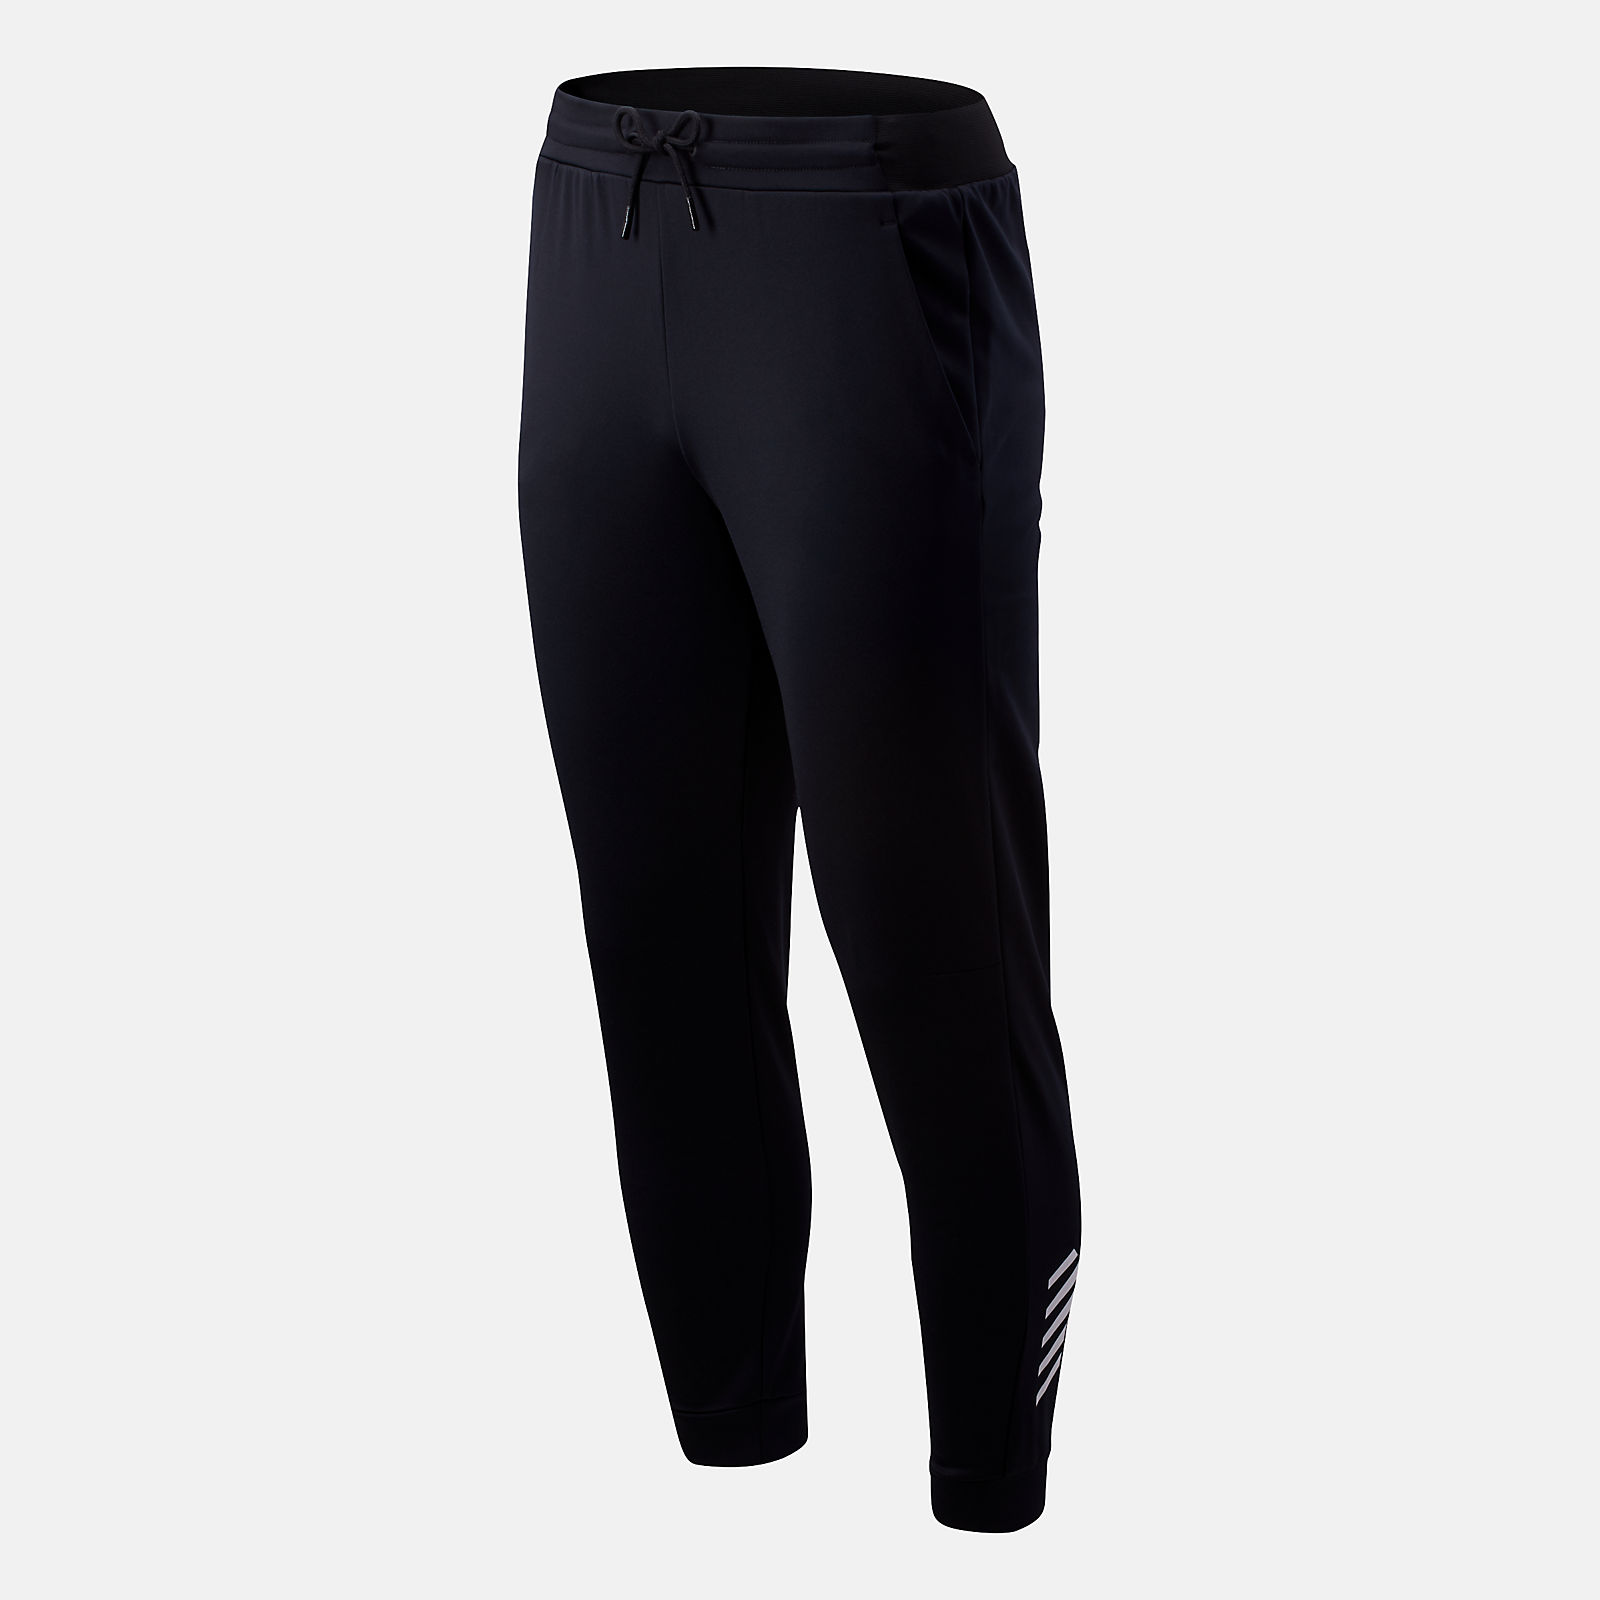 Tenacity Fleece Pant